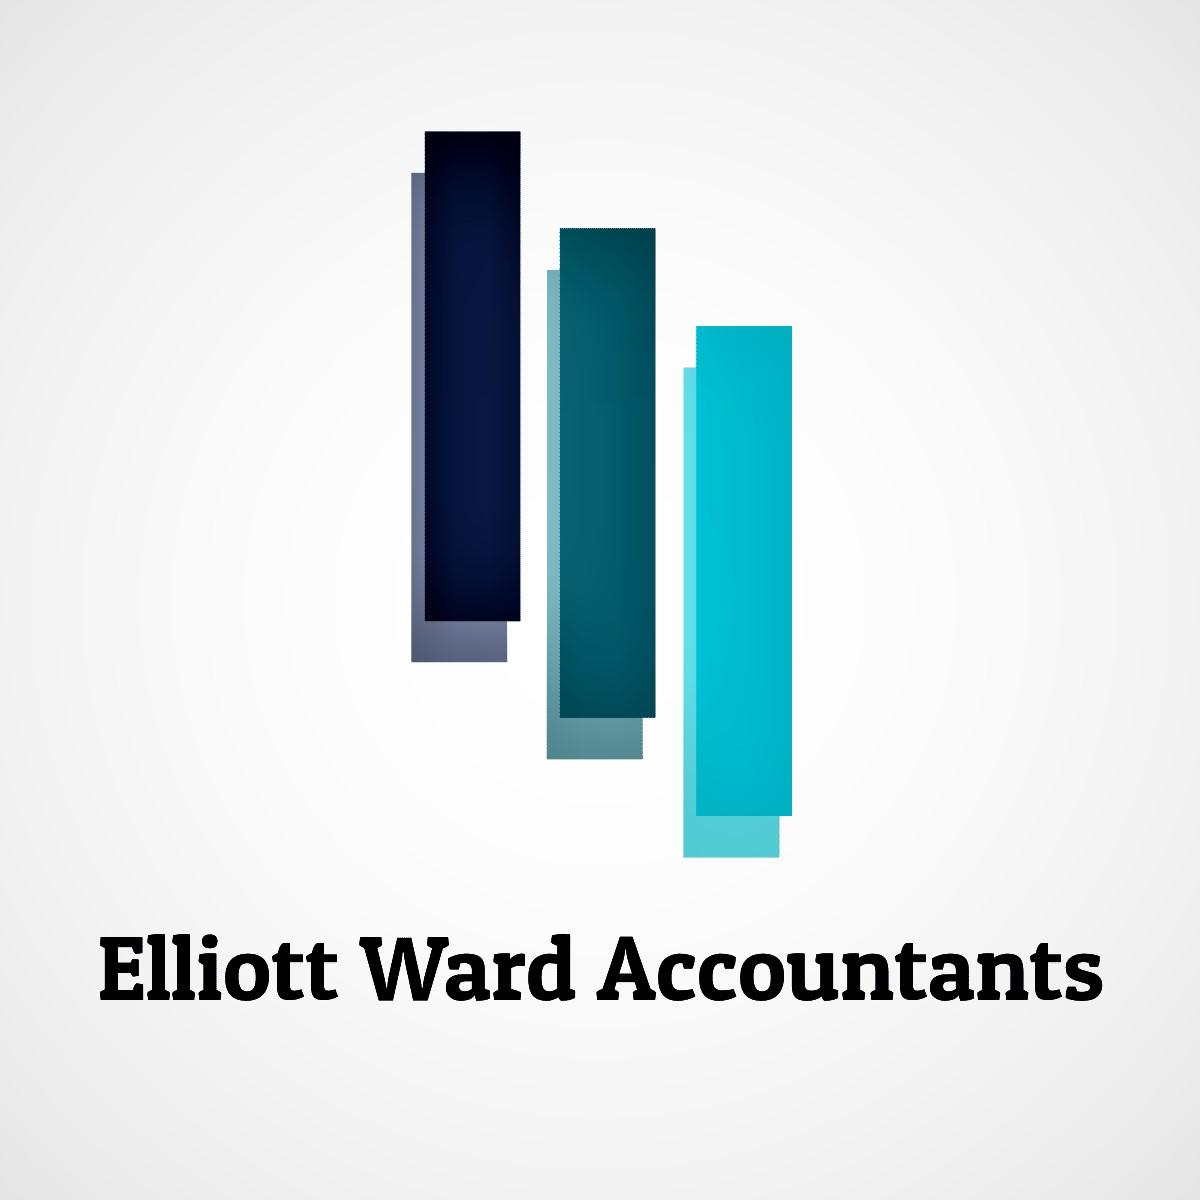 Elliott Ward Accountants